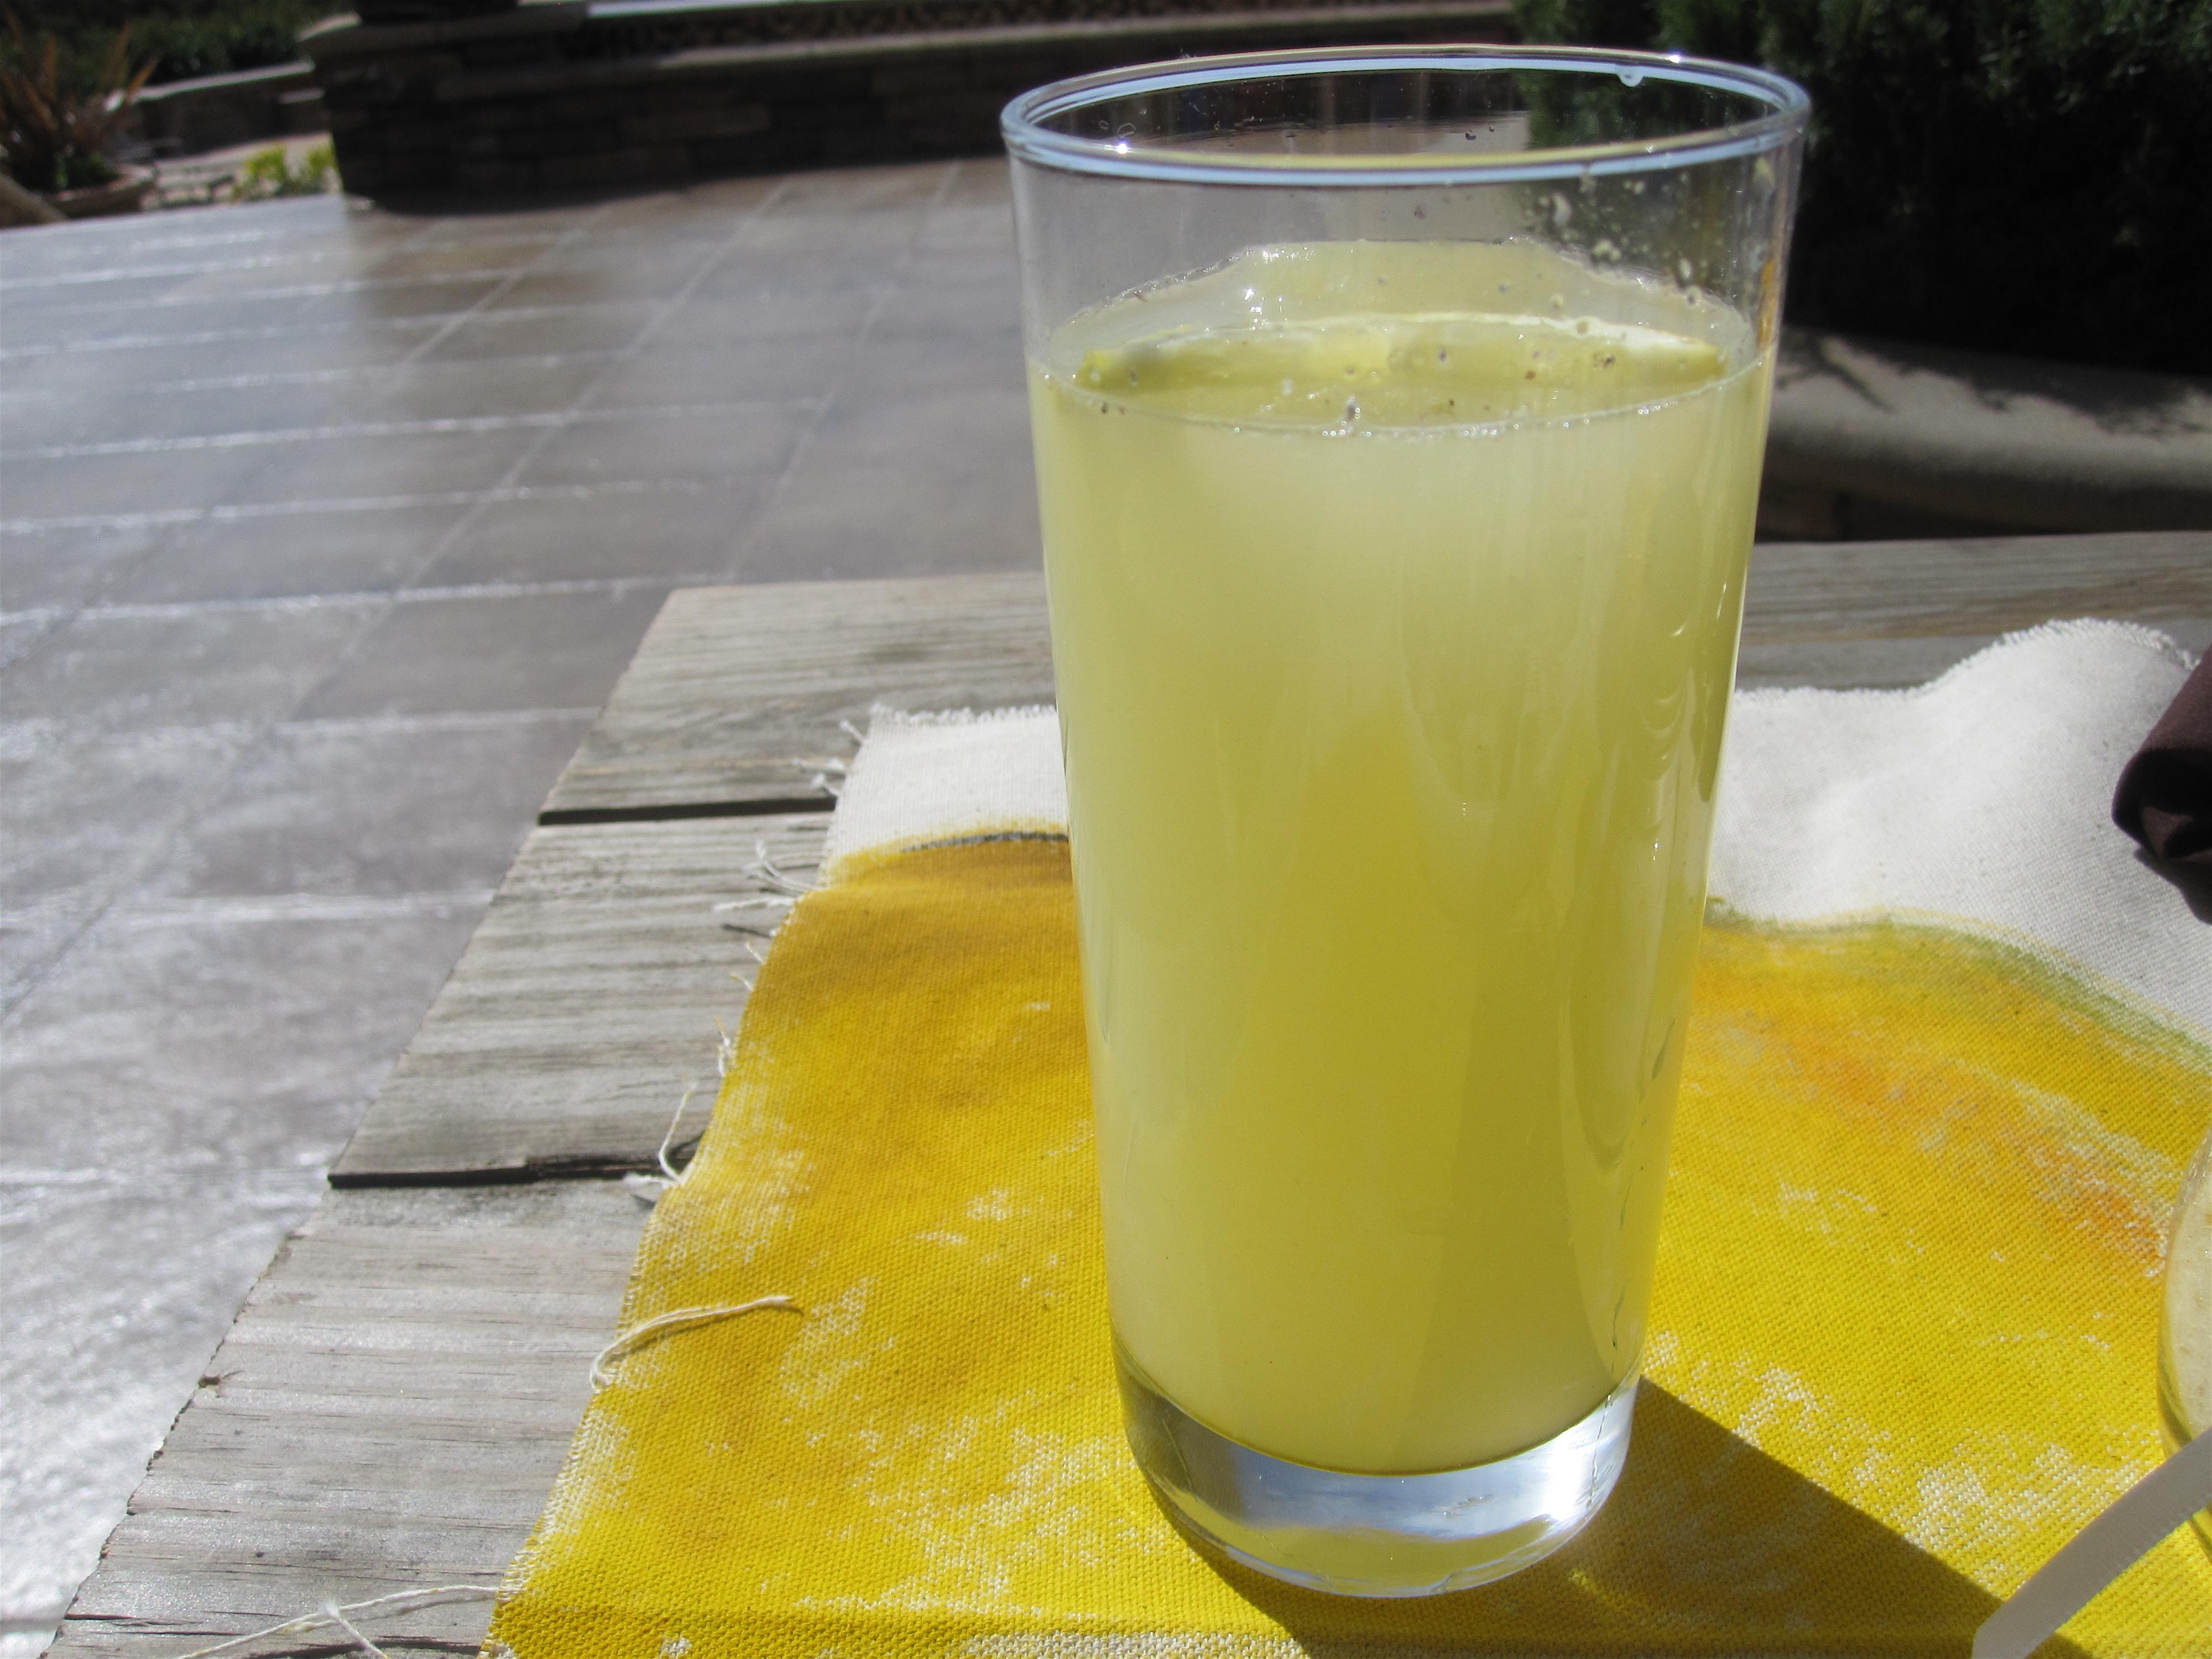 ... best lemonade ever recipe my chick fil a wish list best lemonade ever